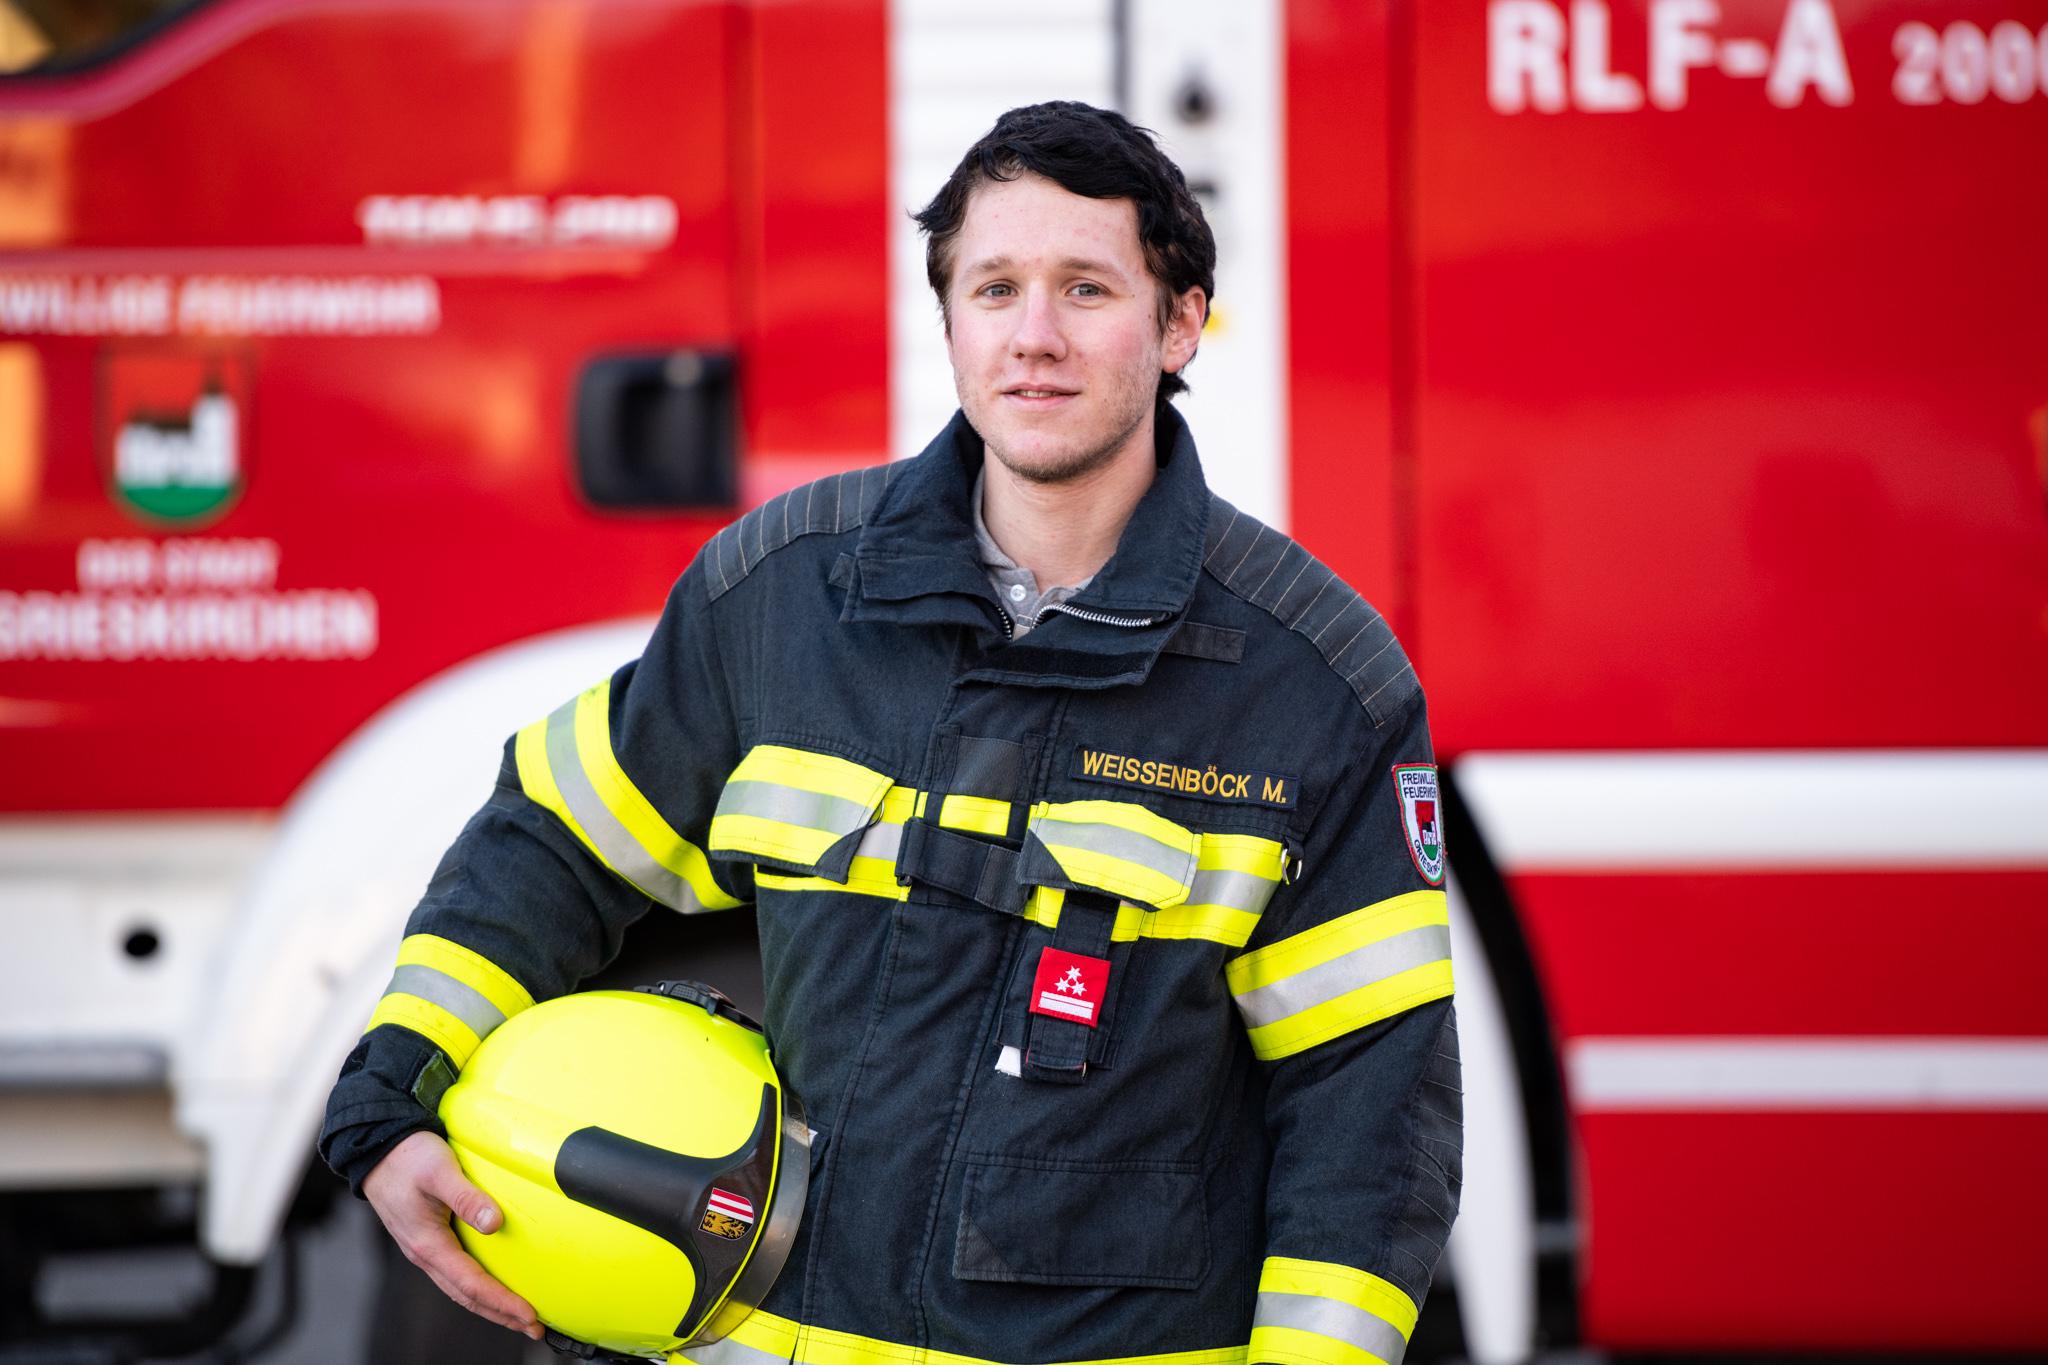 HBM Markus Weissenböck